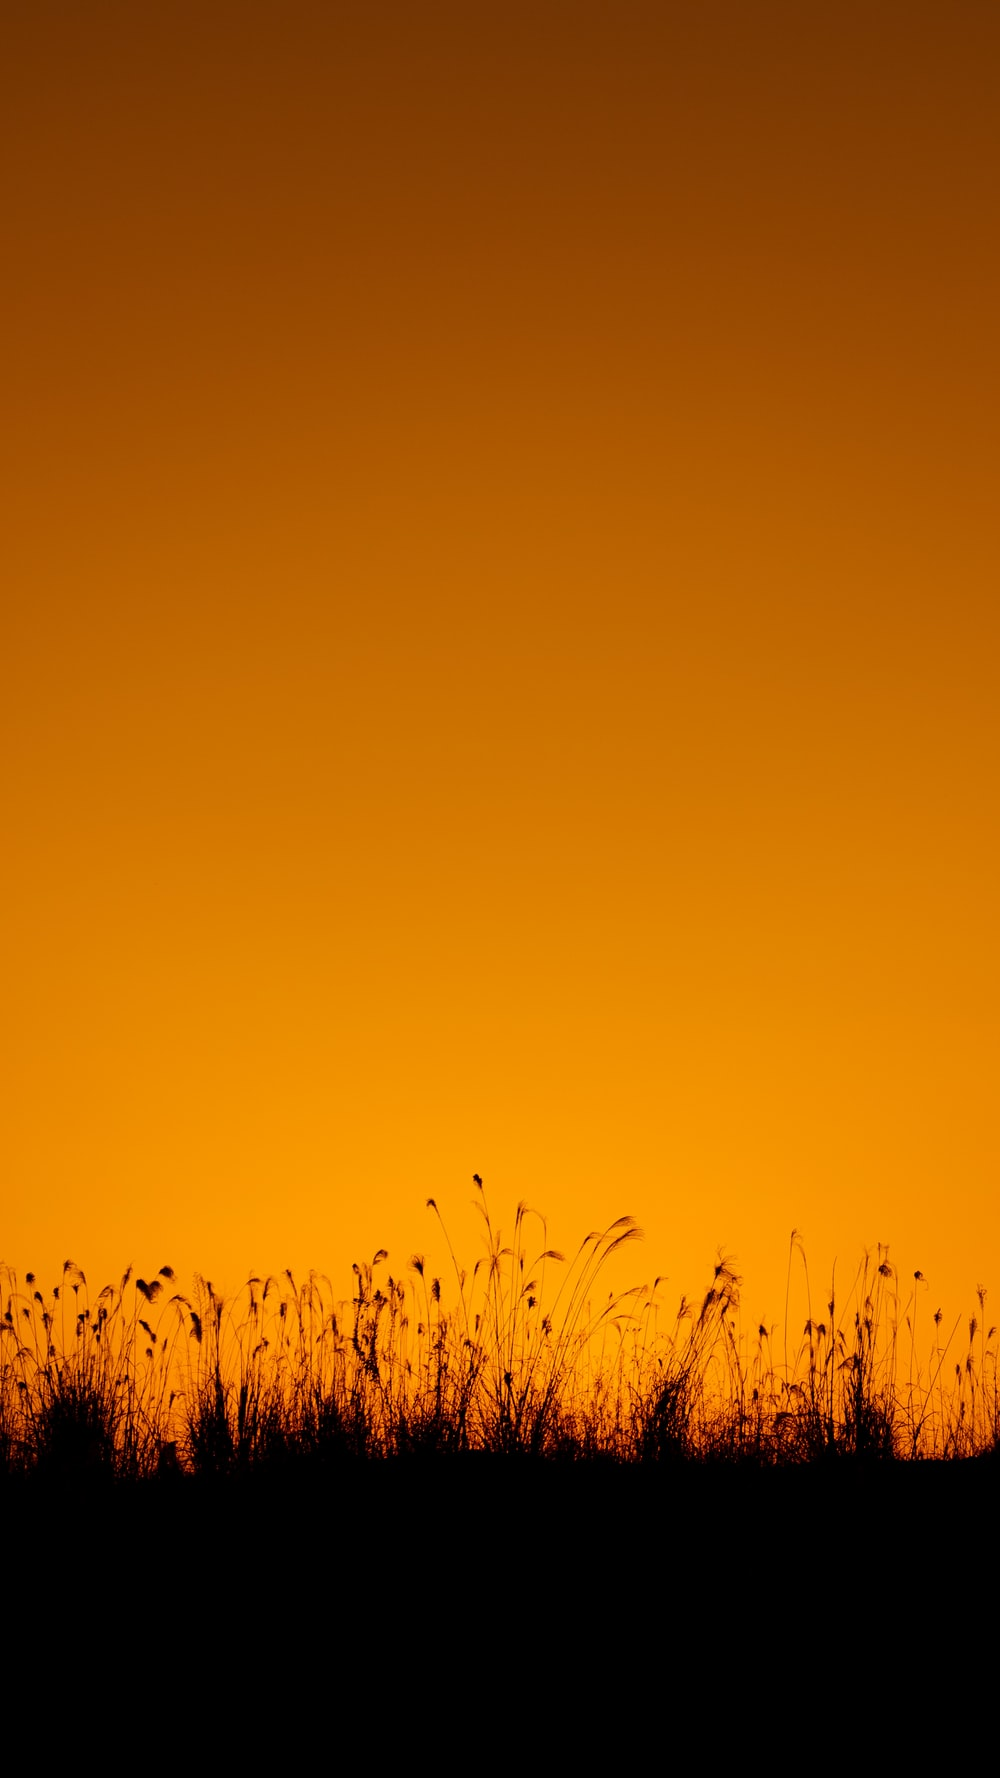 green grass under blue sky during daytime